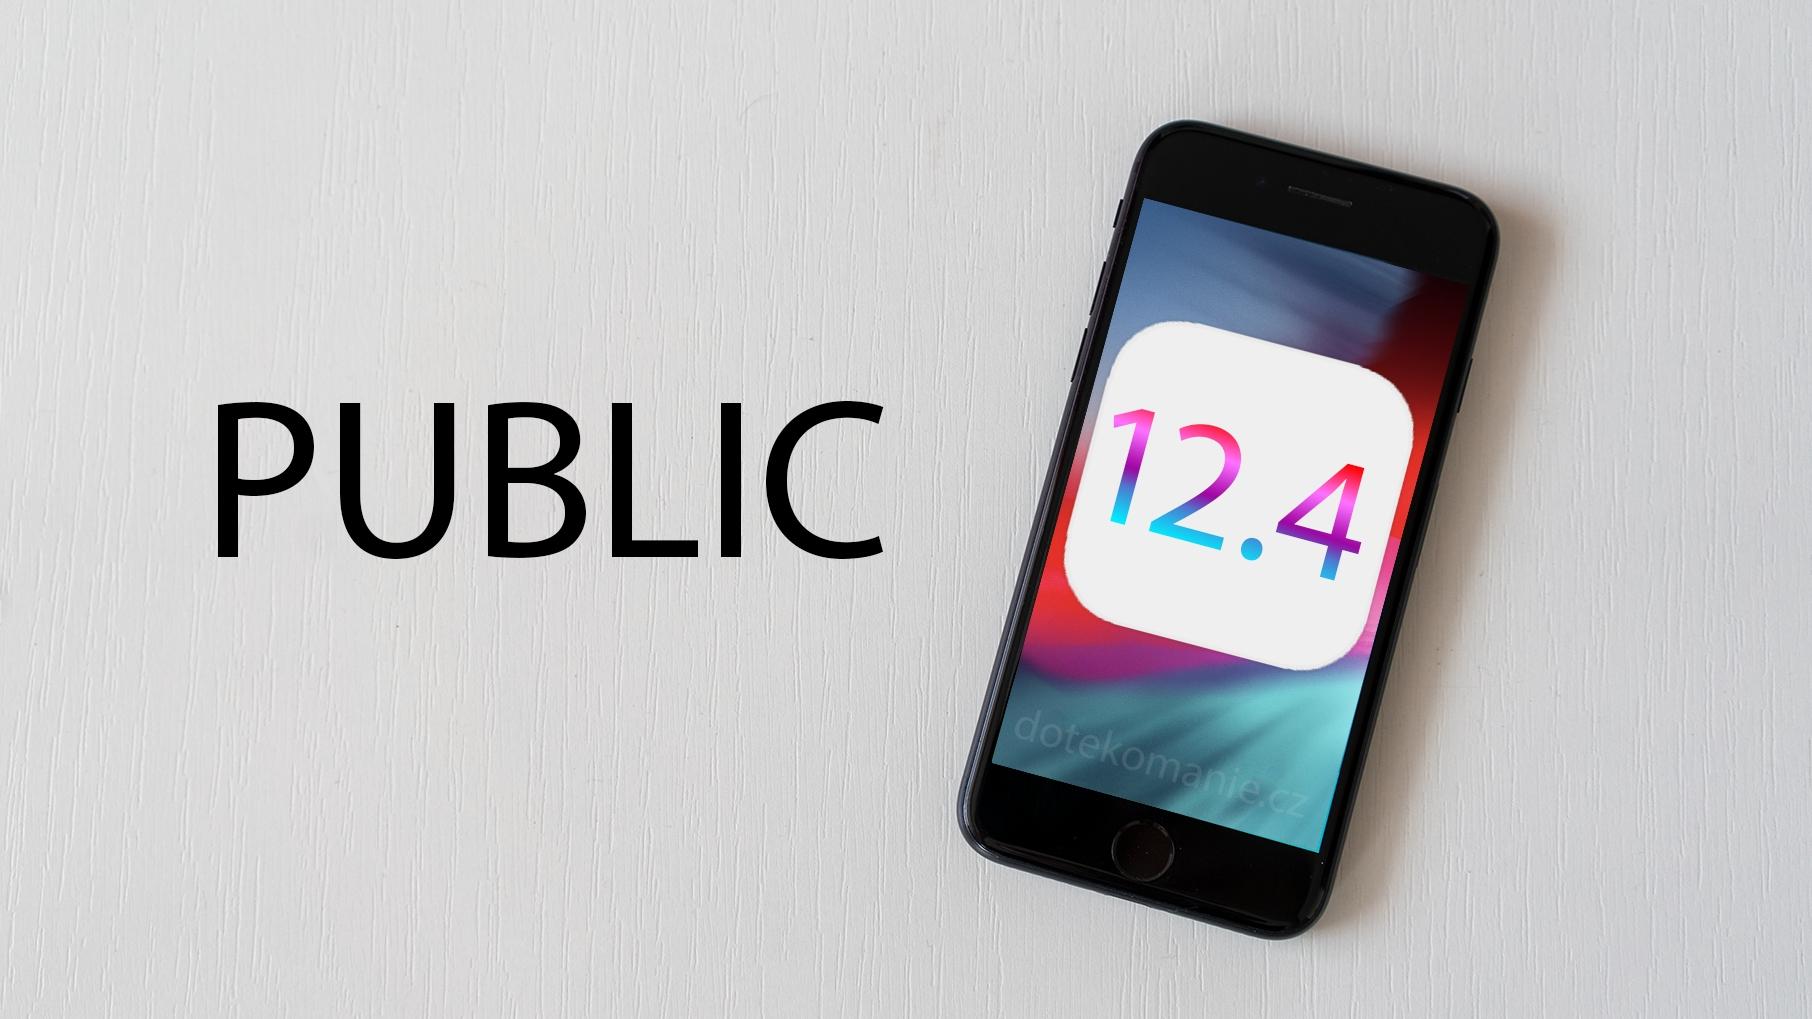 Apple vydal také důležitou aktualizaci iOS 12.4.4